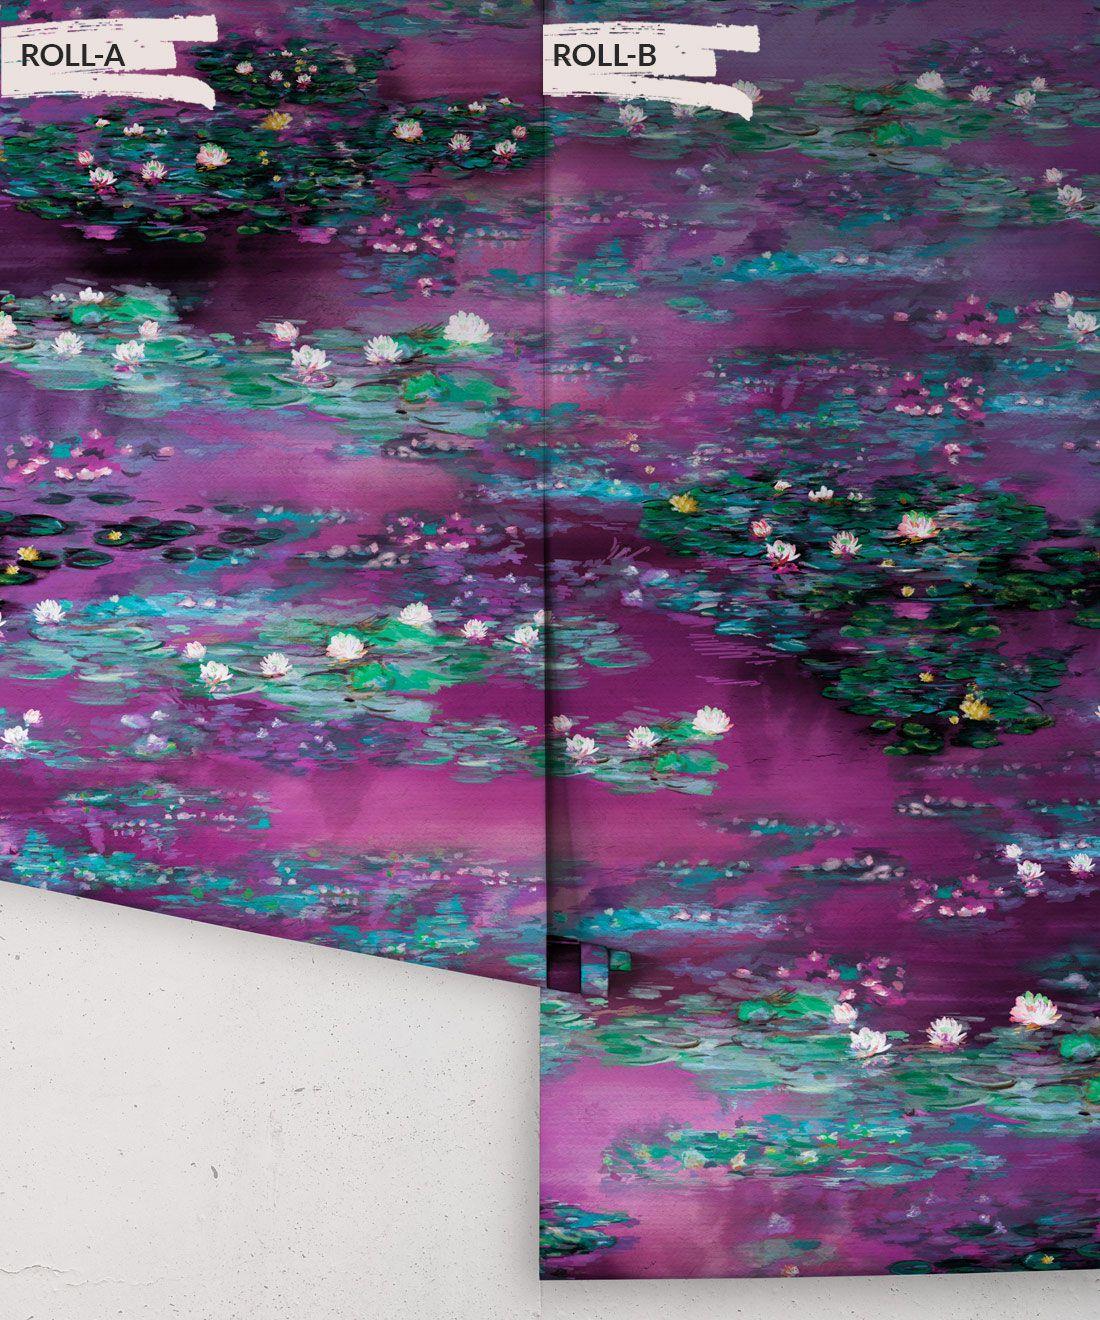 Water Lillies Wallpaper •Abstract Wallpaper • Dreamy Wallpaper • Violeta Wallpaper •Rolls